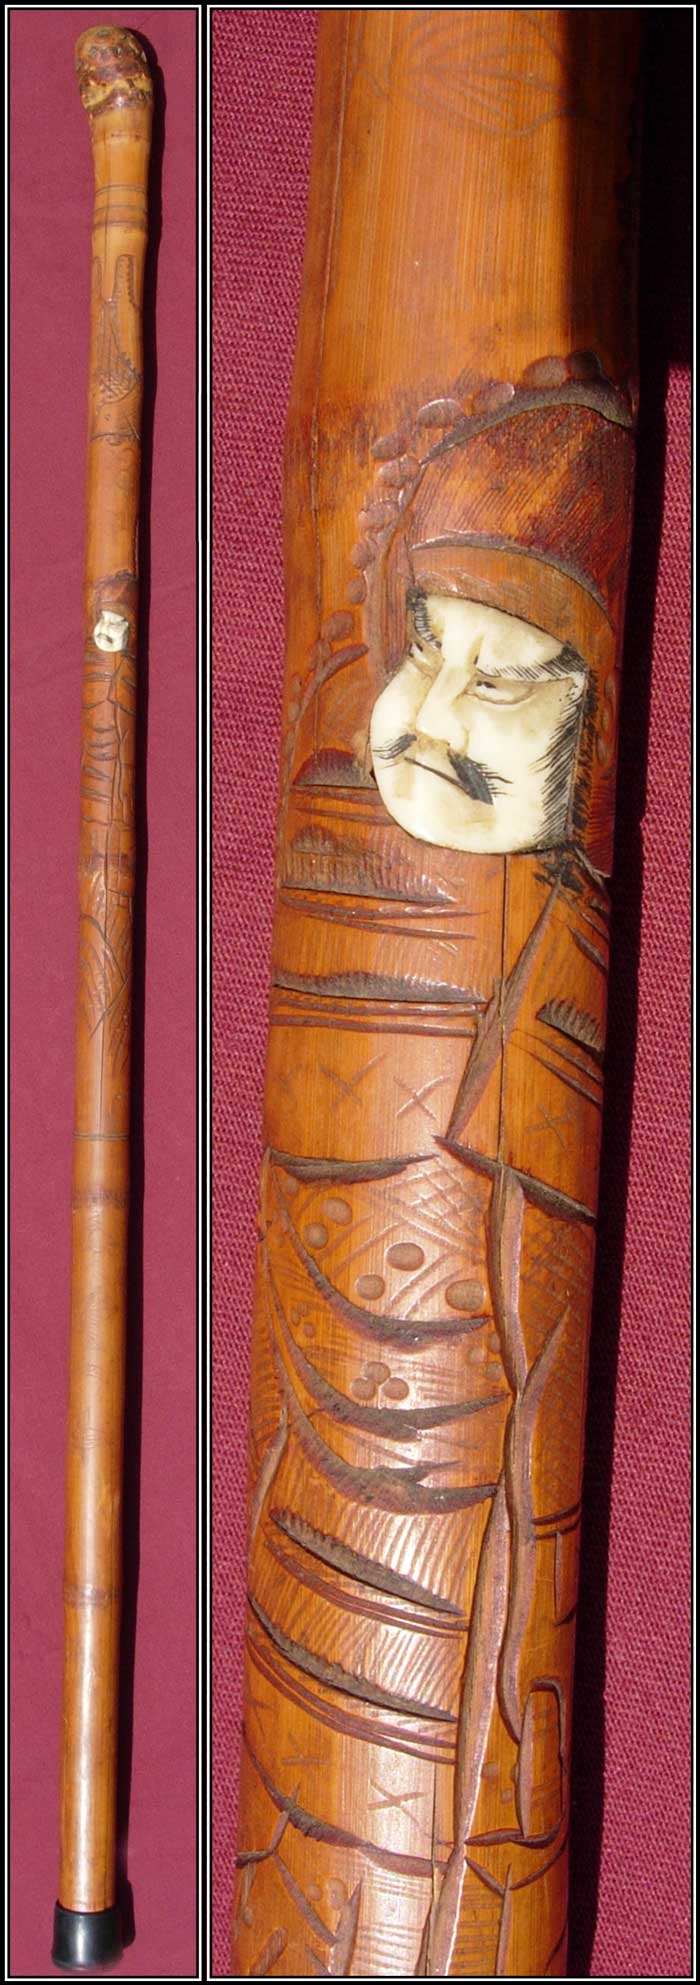 Z Sold Cane Elaborately Carved Bamboo Cane